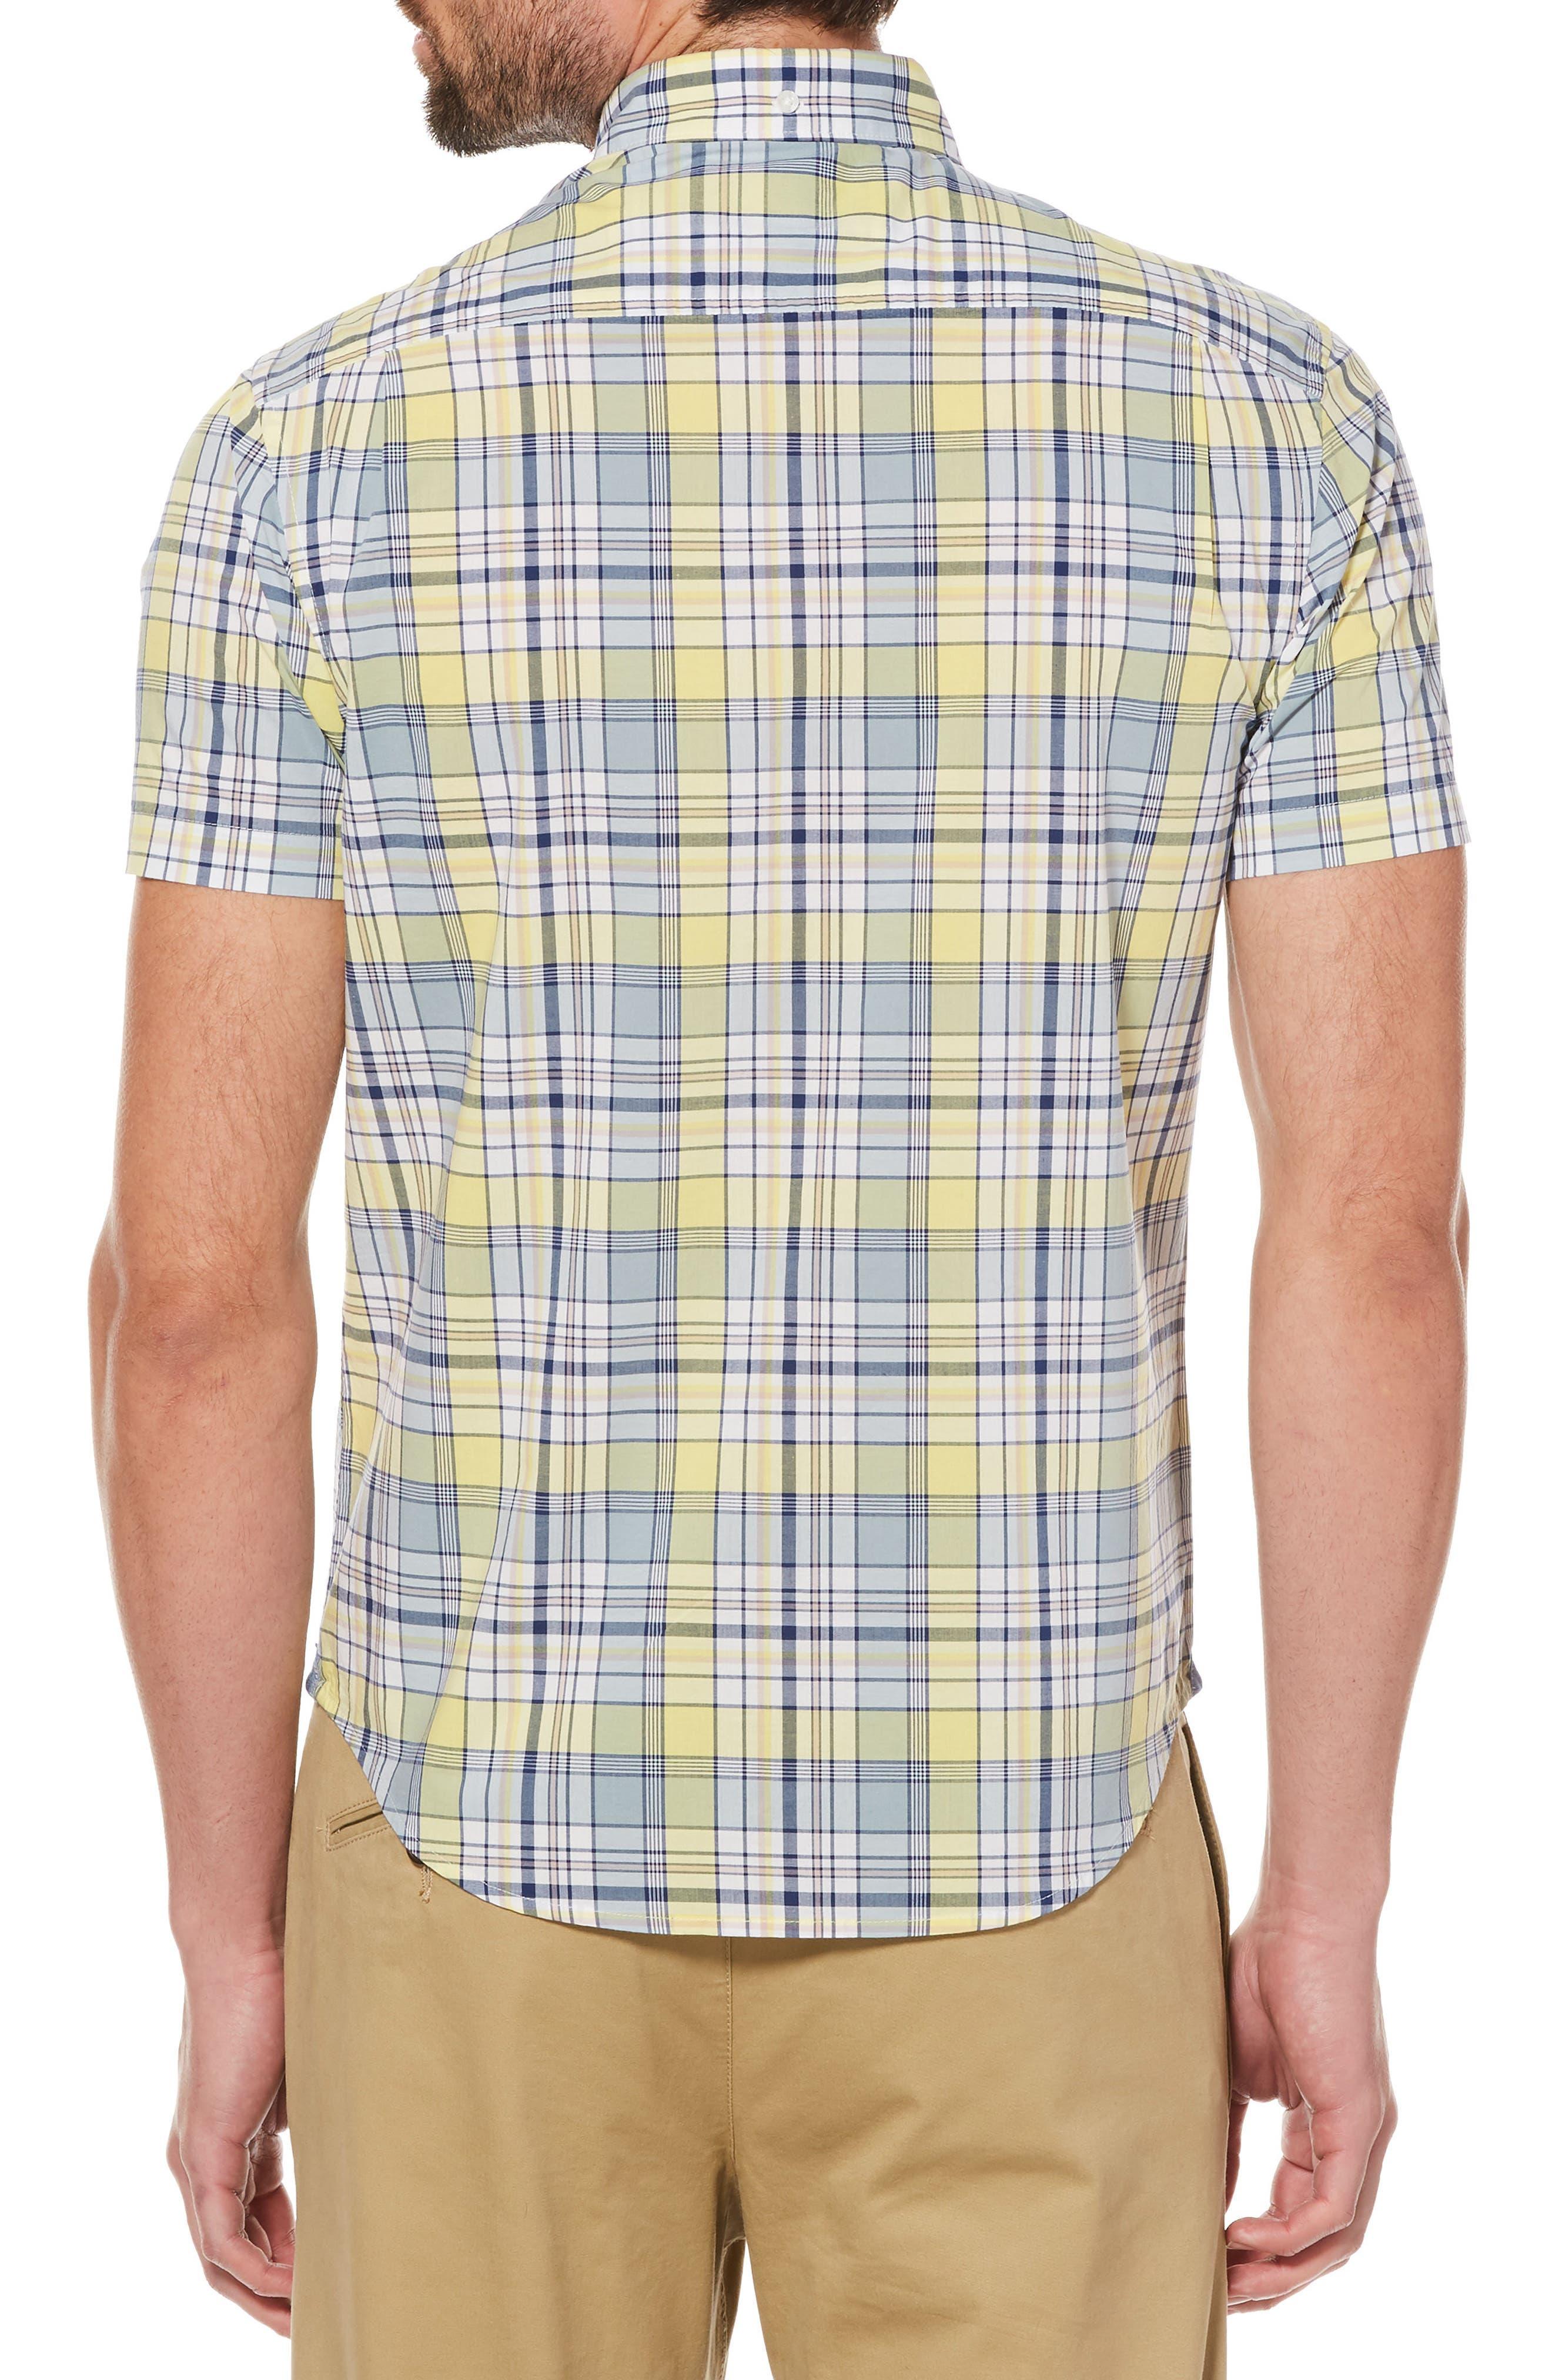 P55 Woven Shirt,                             Alternate thumbnail 2, color,                             Limelight